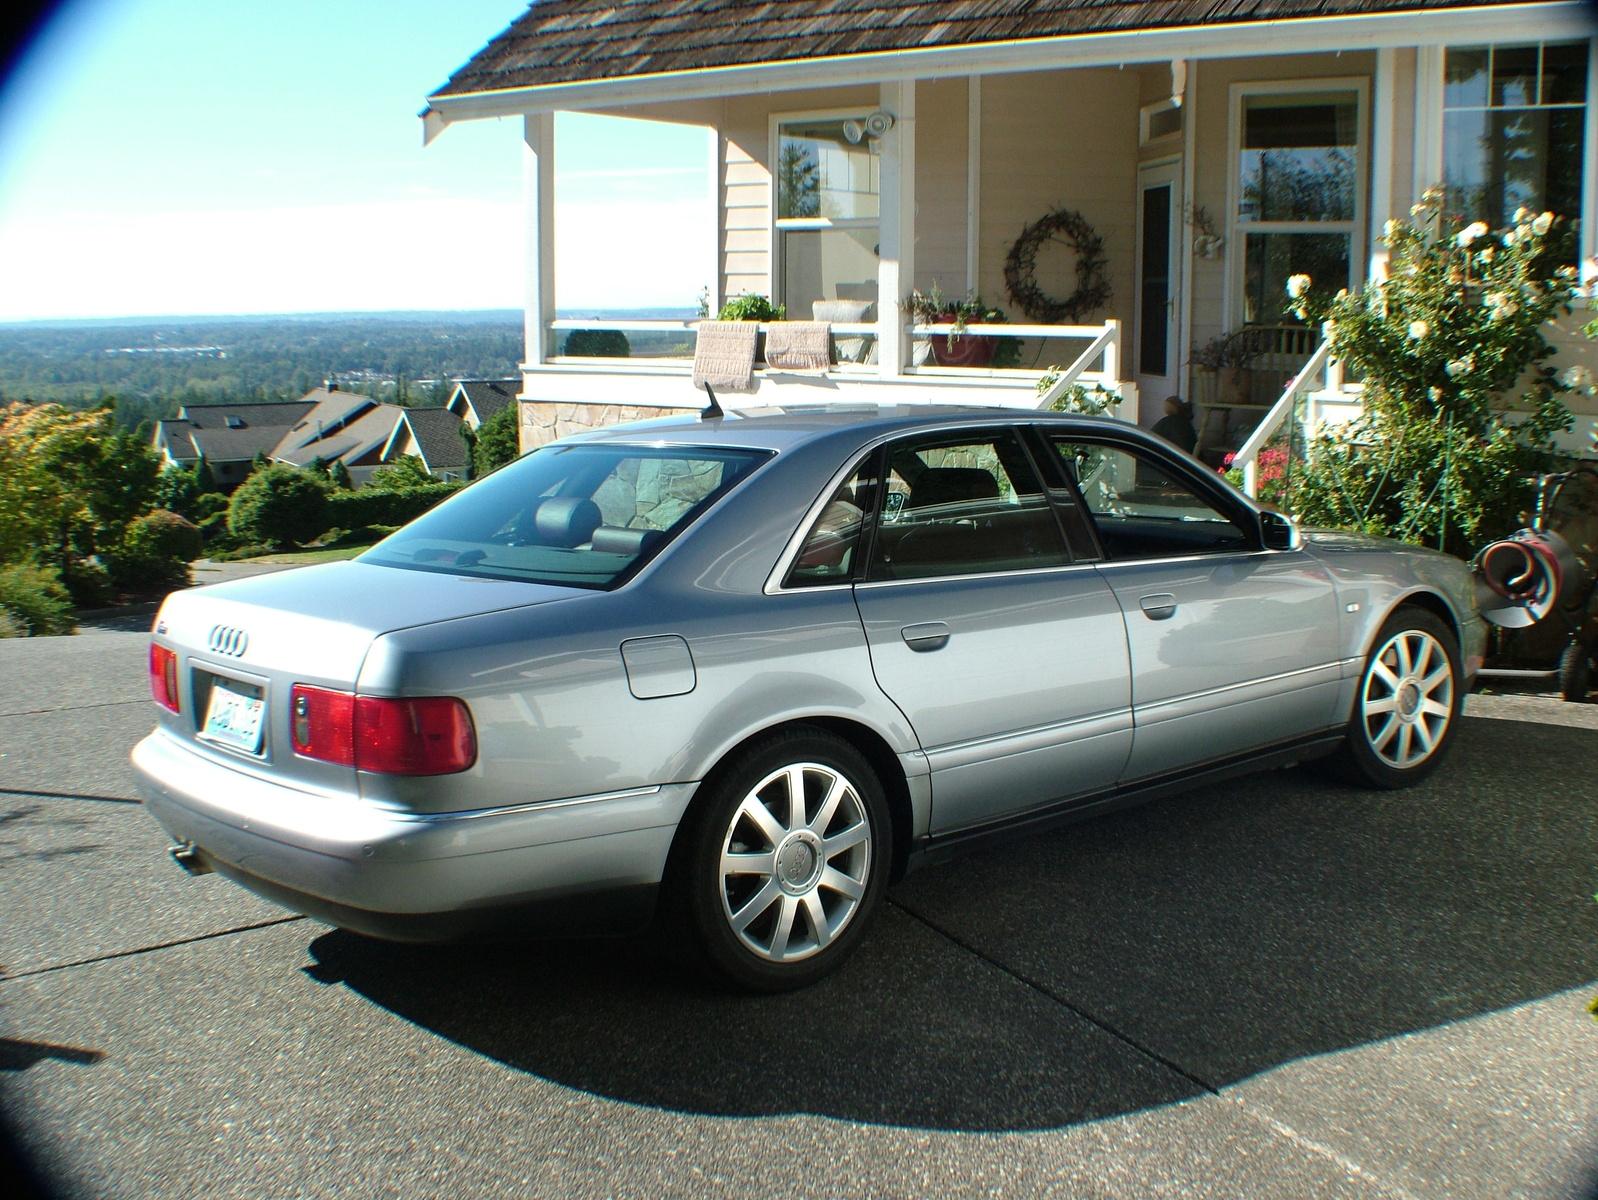 2003 Audi S8 - Overview - CarGurus